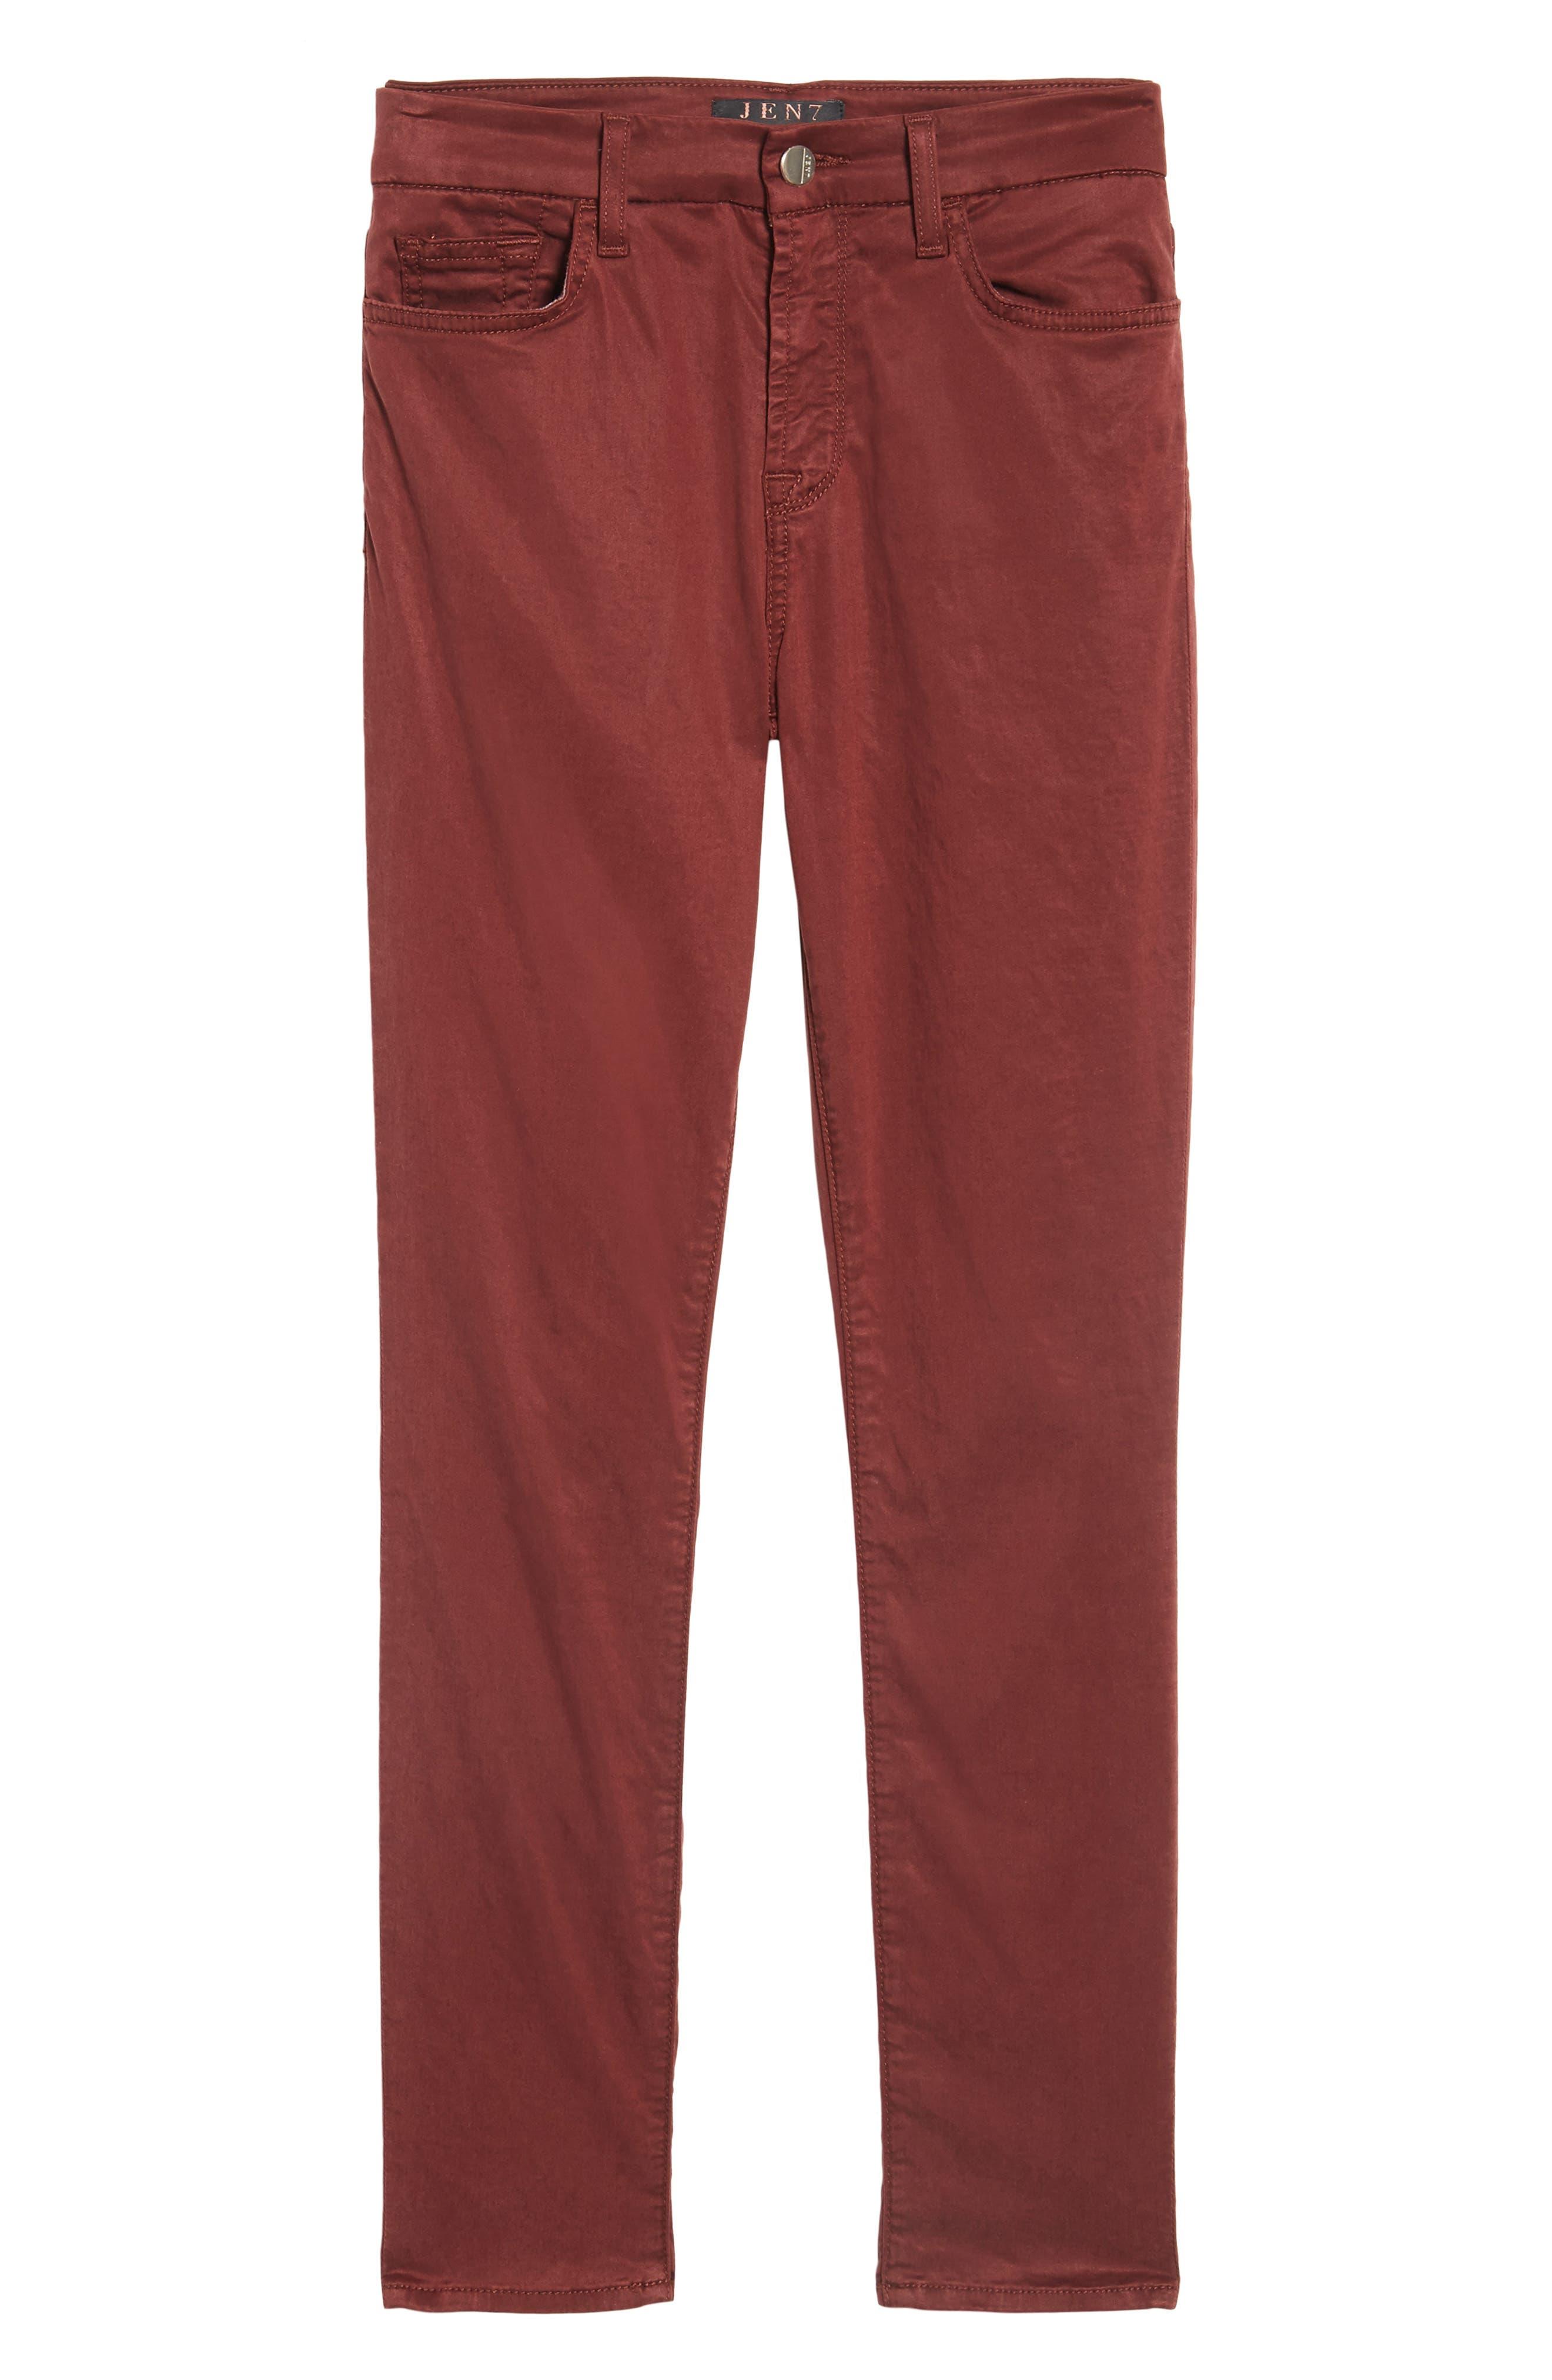 Sateen Skinny Ankle Jeans,                             Alternate thumbnail 6, color,                             201